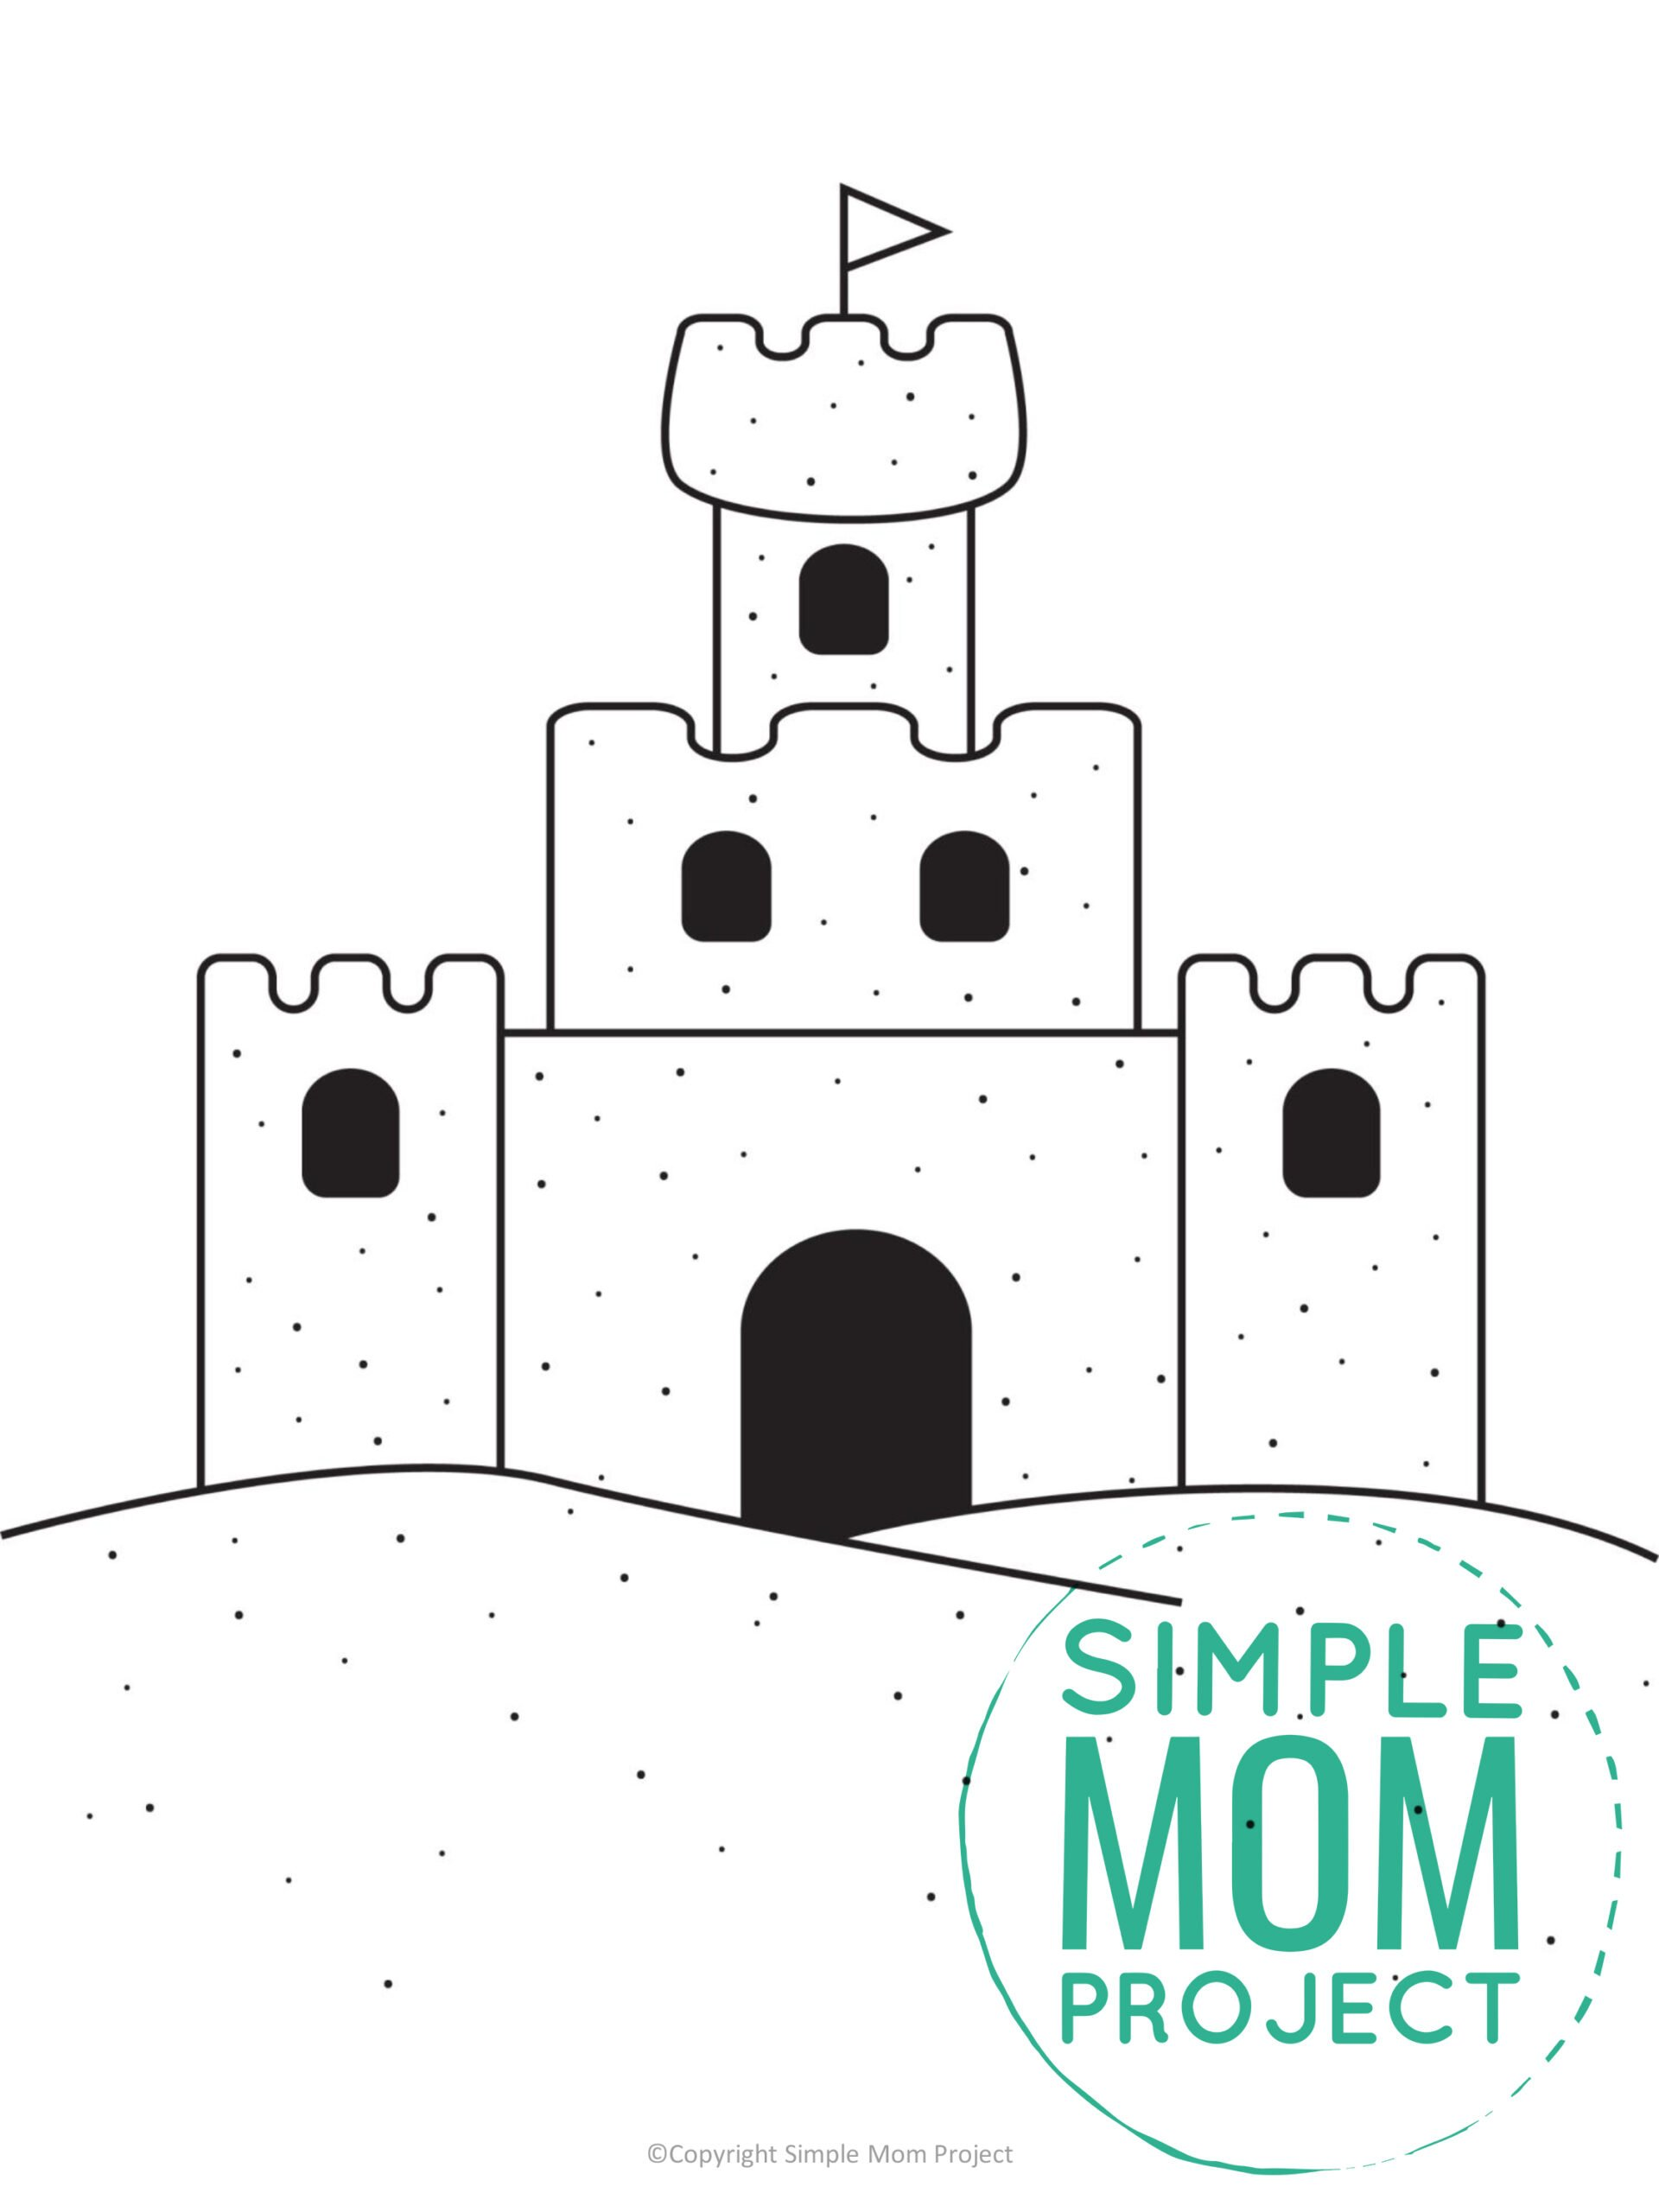 Free Printable Summer Beach Sandcastle Template for Kids, preschooler and toddler